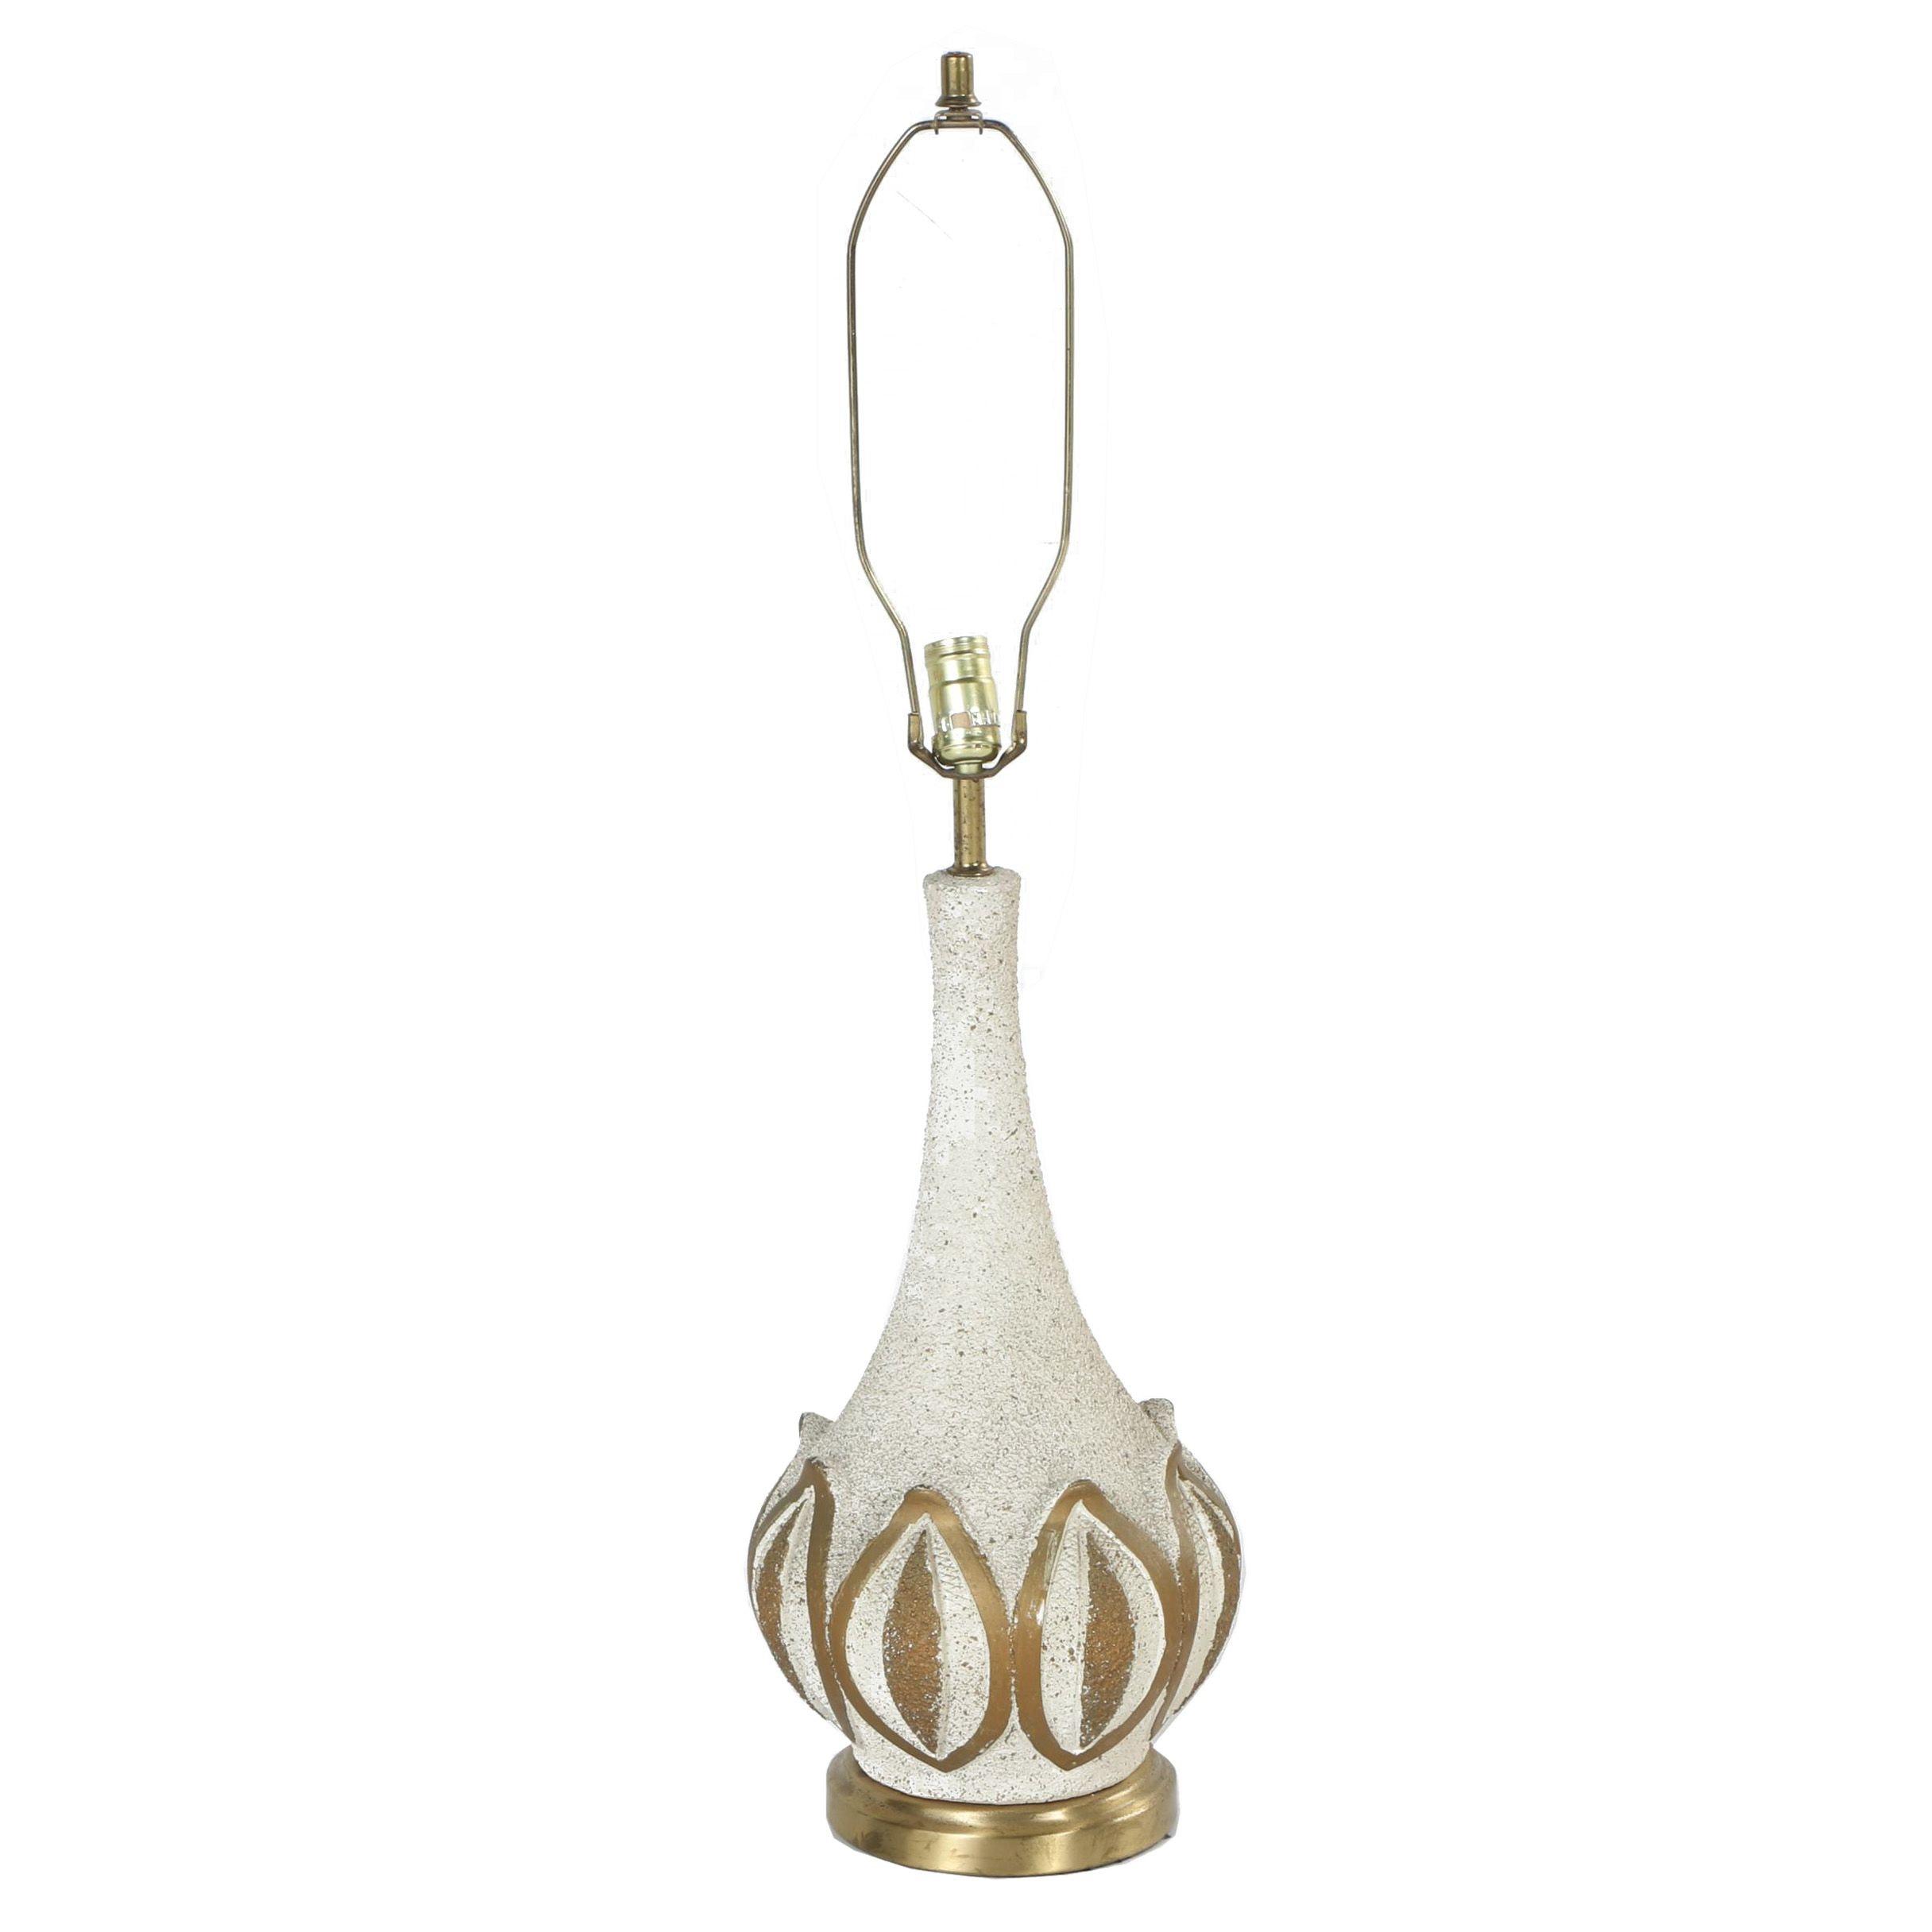 Vintage Ceramic Table Lamp